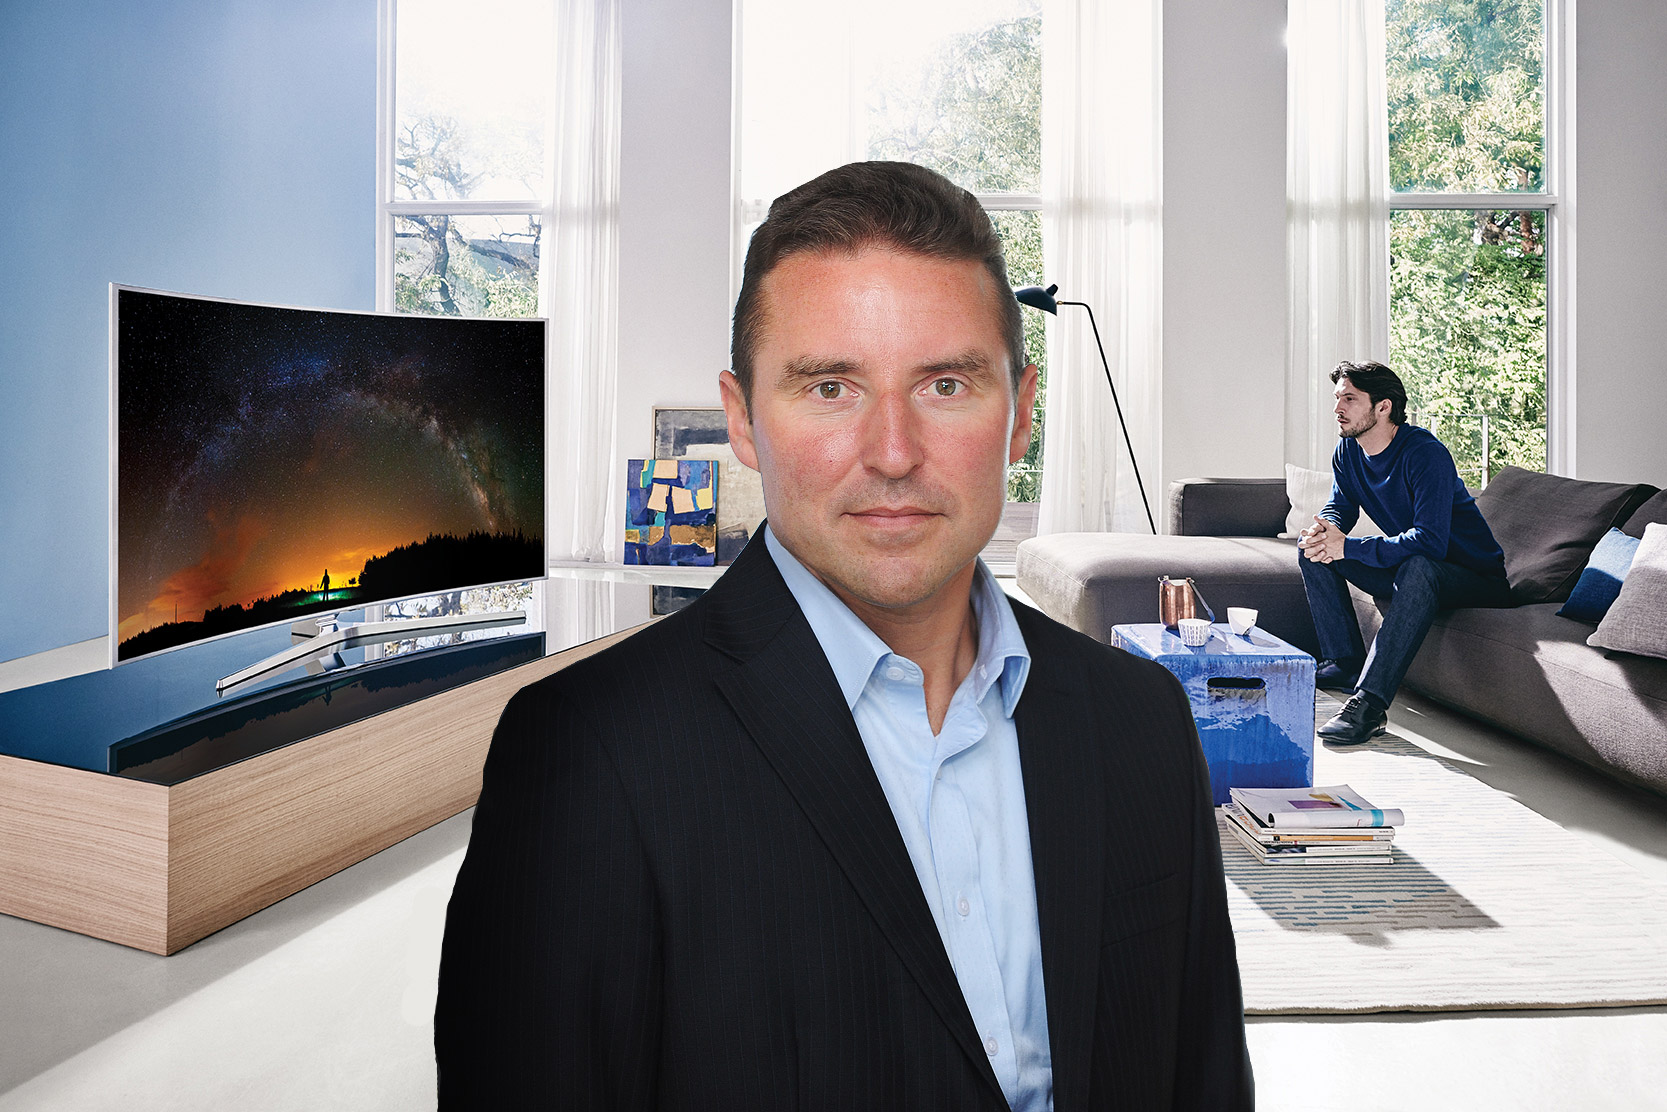 Luxurious Magazine Meets Robert King of Samsung Consumer Electronics